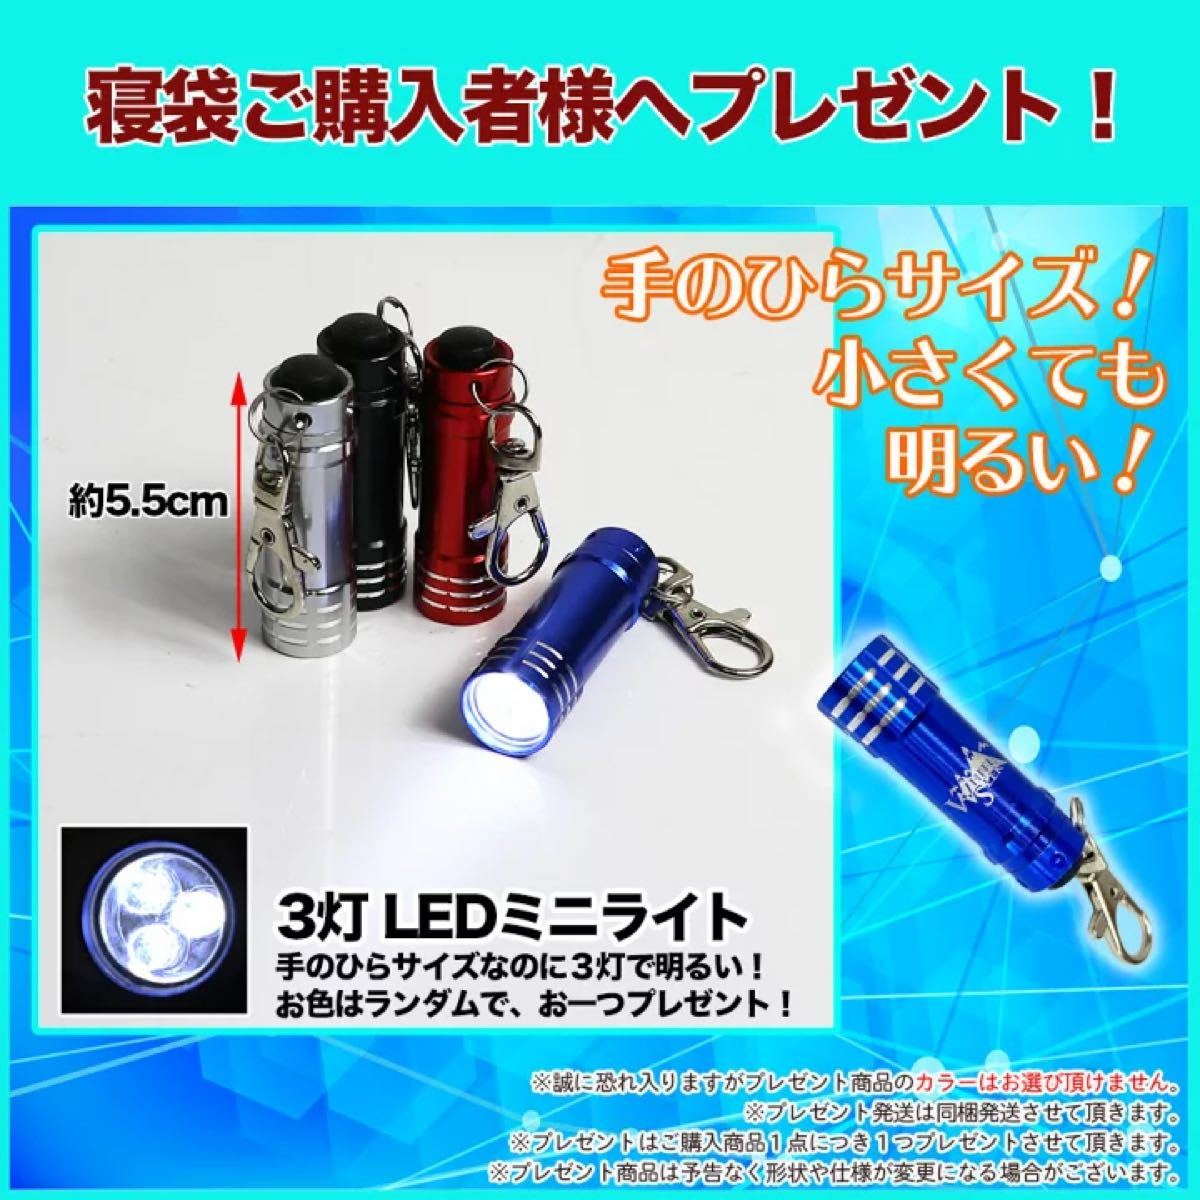 【kaku様専用】寝袋 シュラフ 封筒型 3個セット 春夏 連結可能 コンパクト アウトドア 防災 1人キャンプ